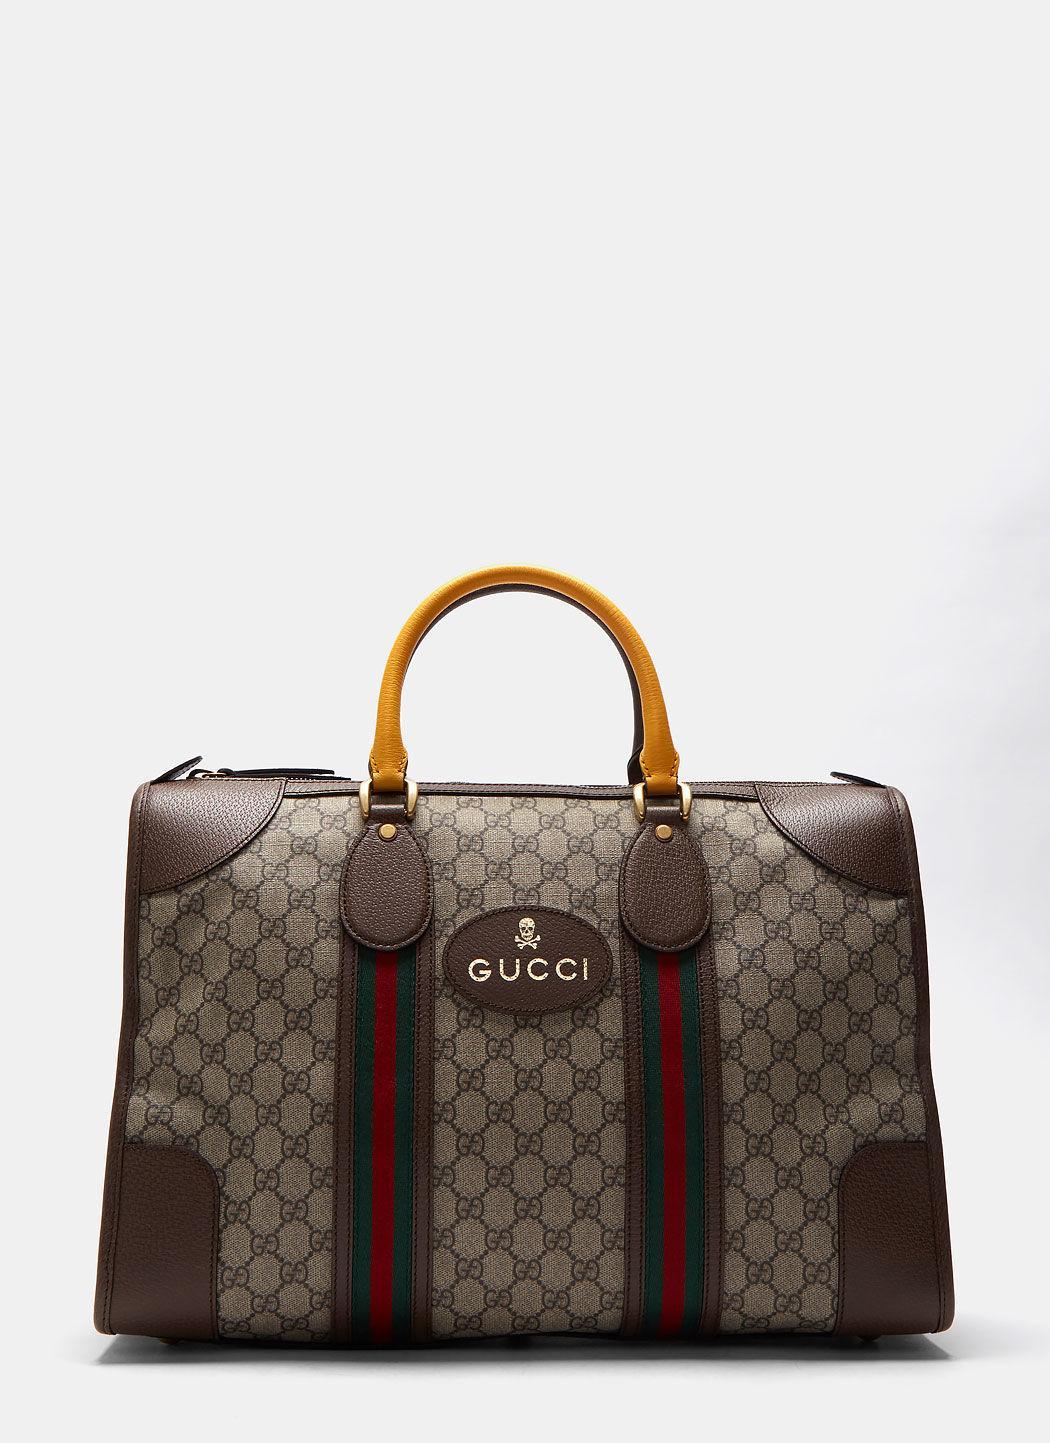 Lyst - Gucci Men s Neo Vintage Gg Supreme Print Webbing Duffle Bag ... 0c91709bb7a8e